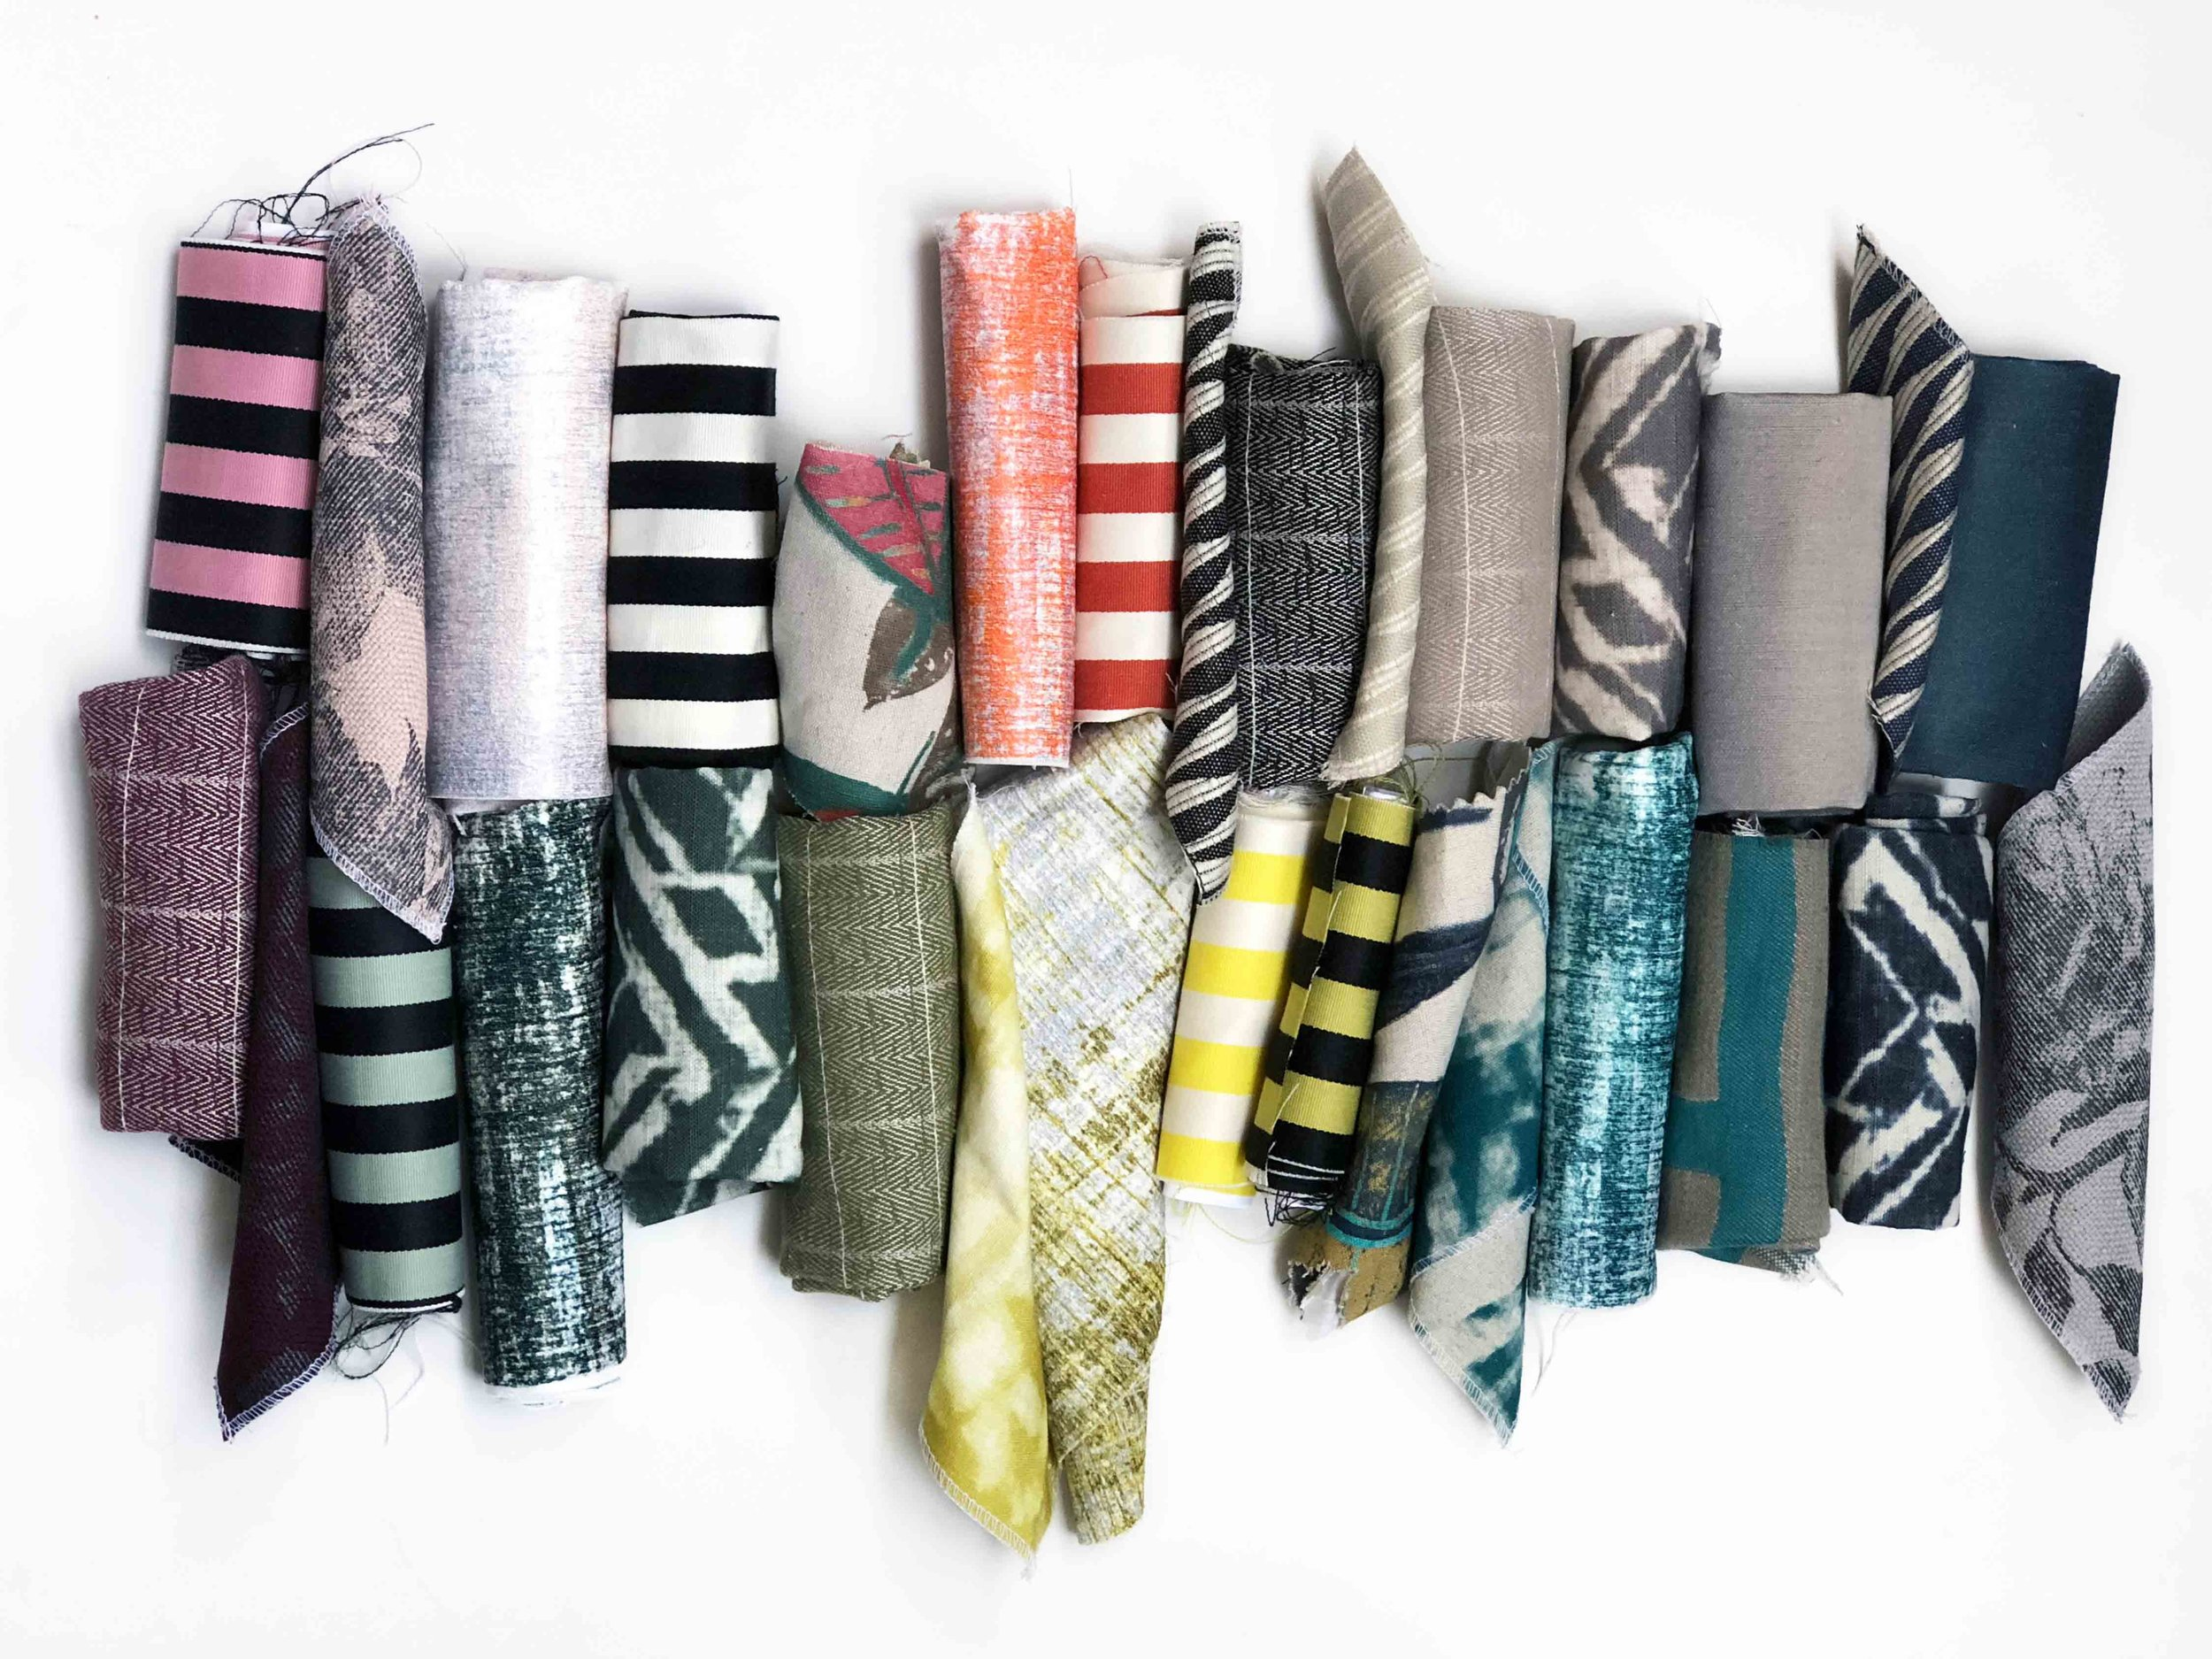 Fil-Doux-Textiles-Coast-to-Coast-13.jpg